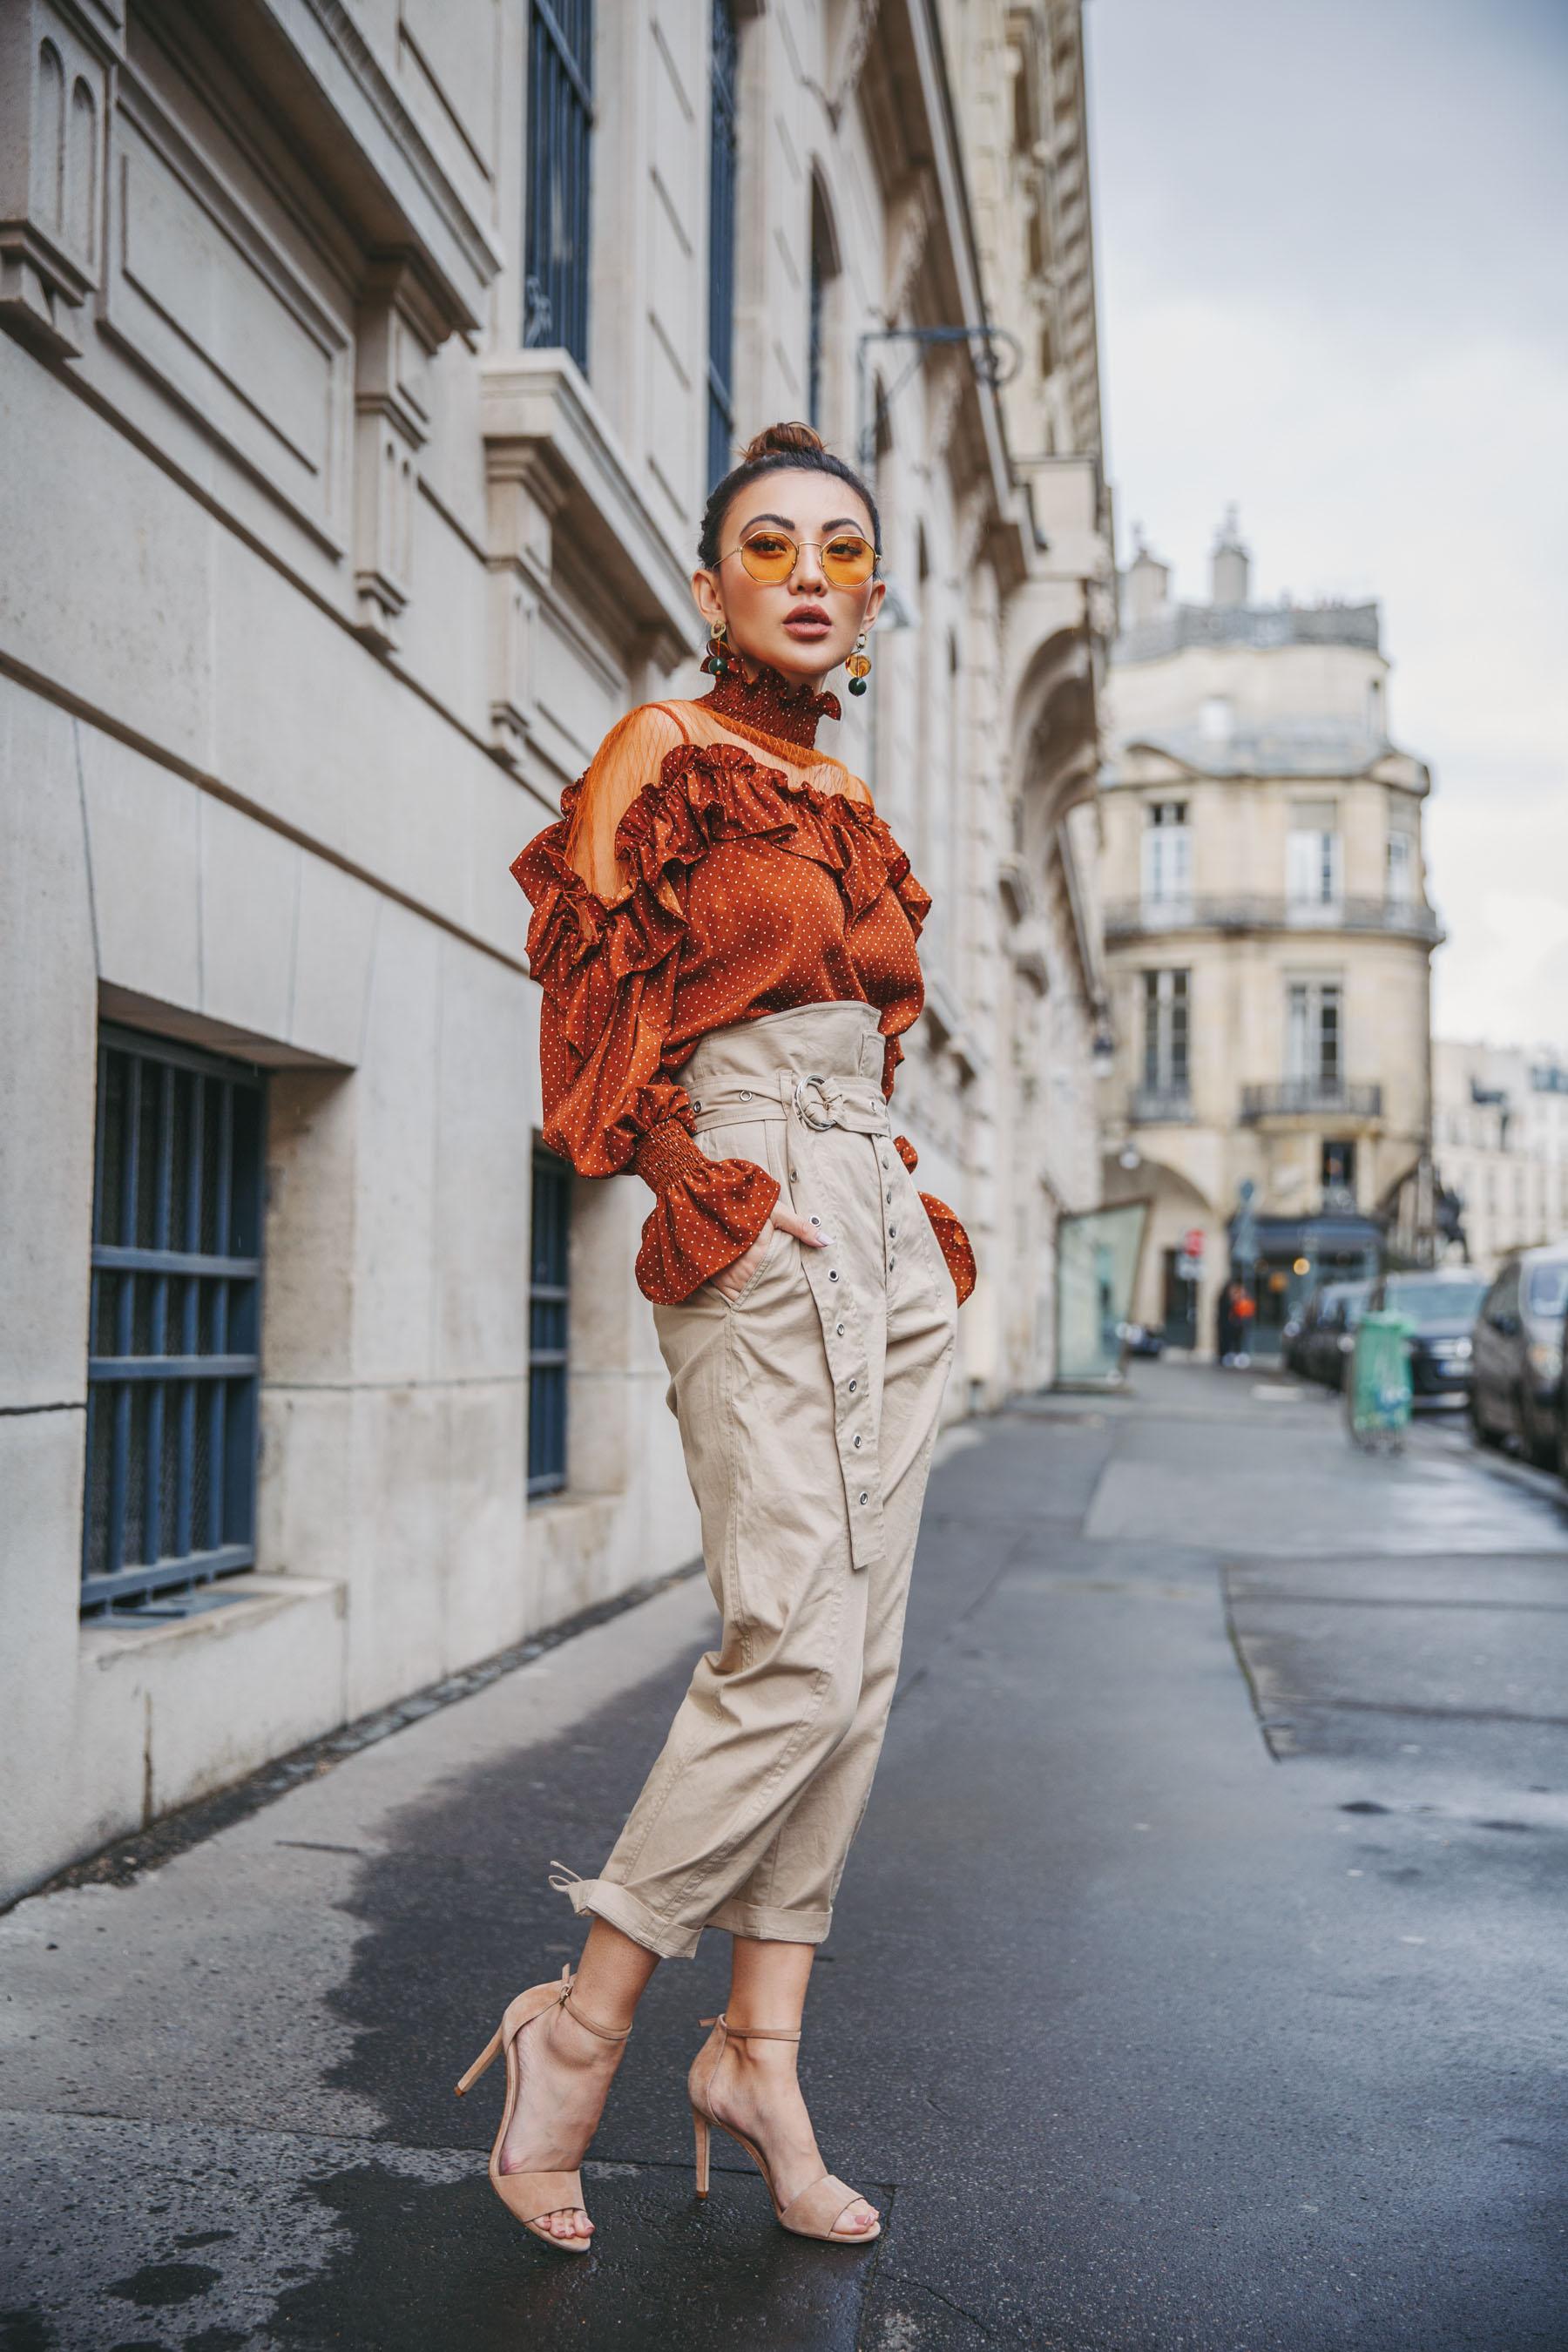 trending Prints to Wear in 2018 - red sheer polka dot shirt // Notjessfashion.com